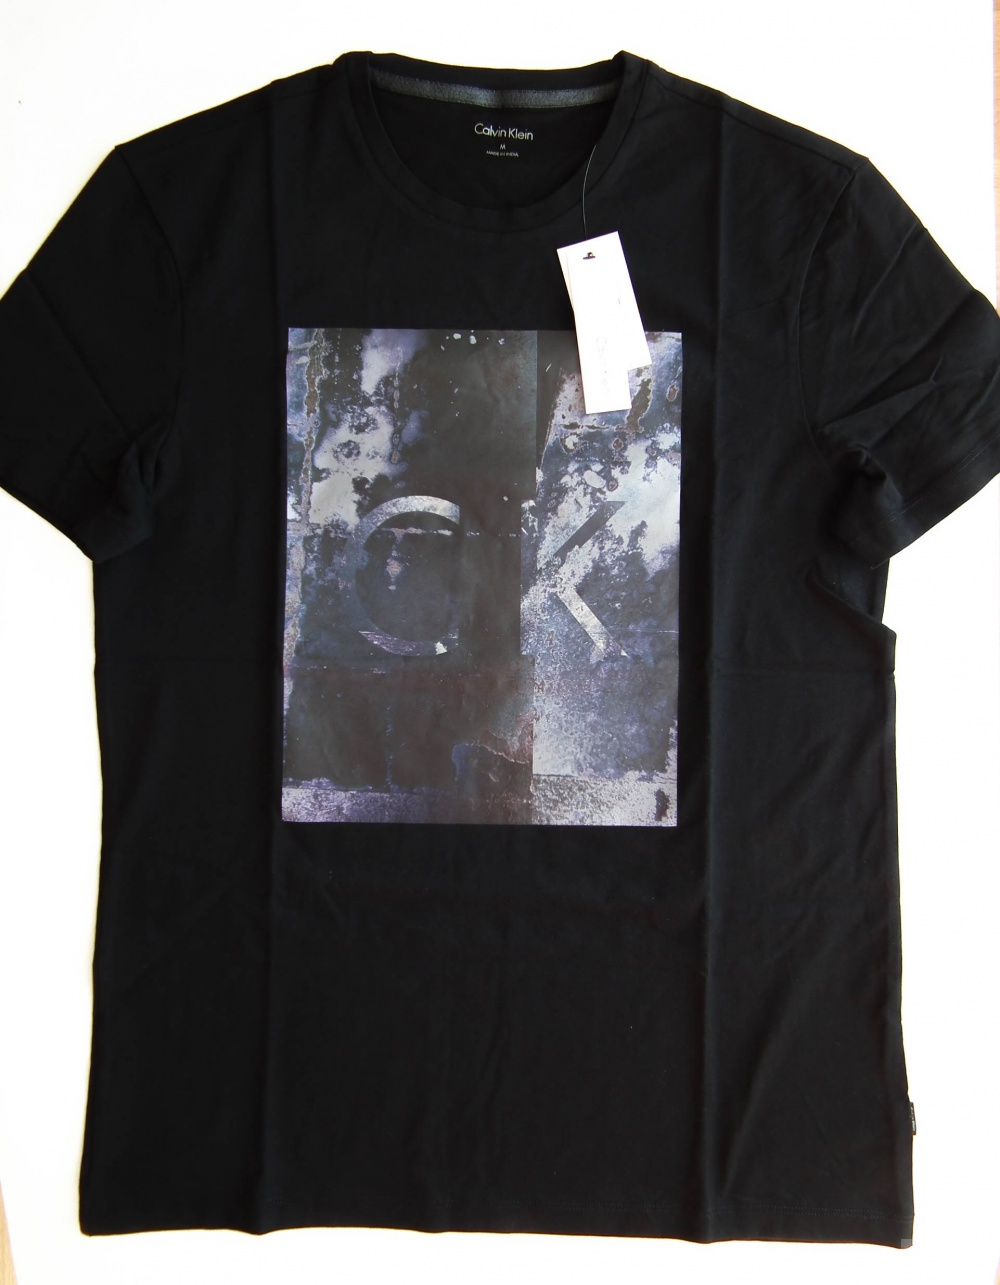 Мужская футболка Calvin Klein М